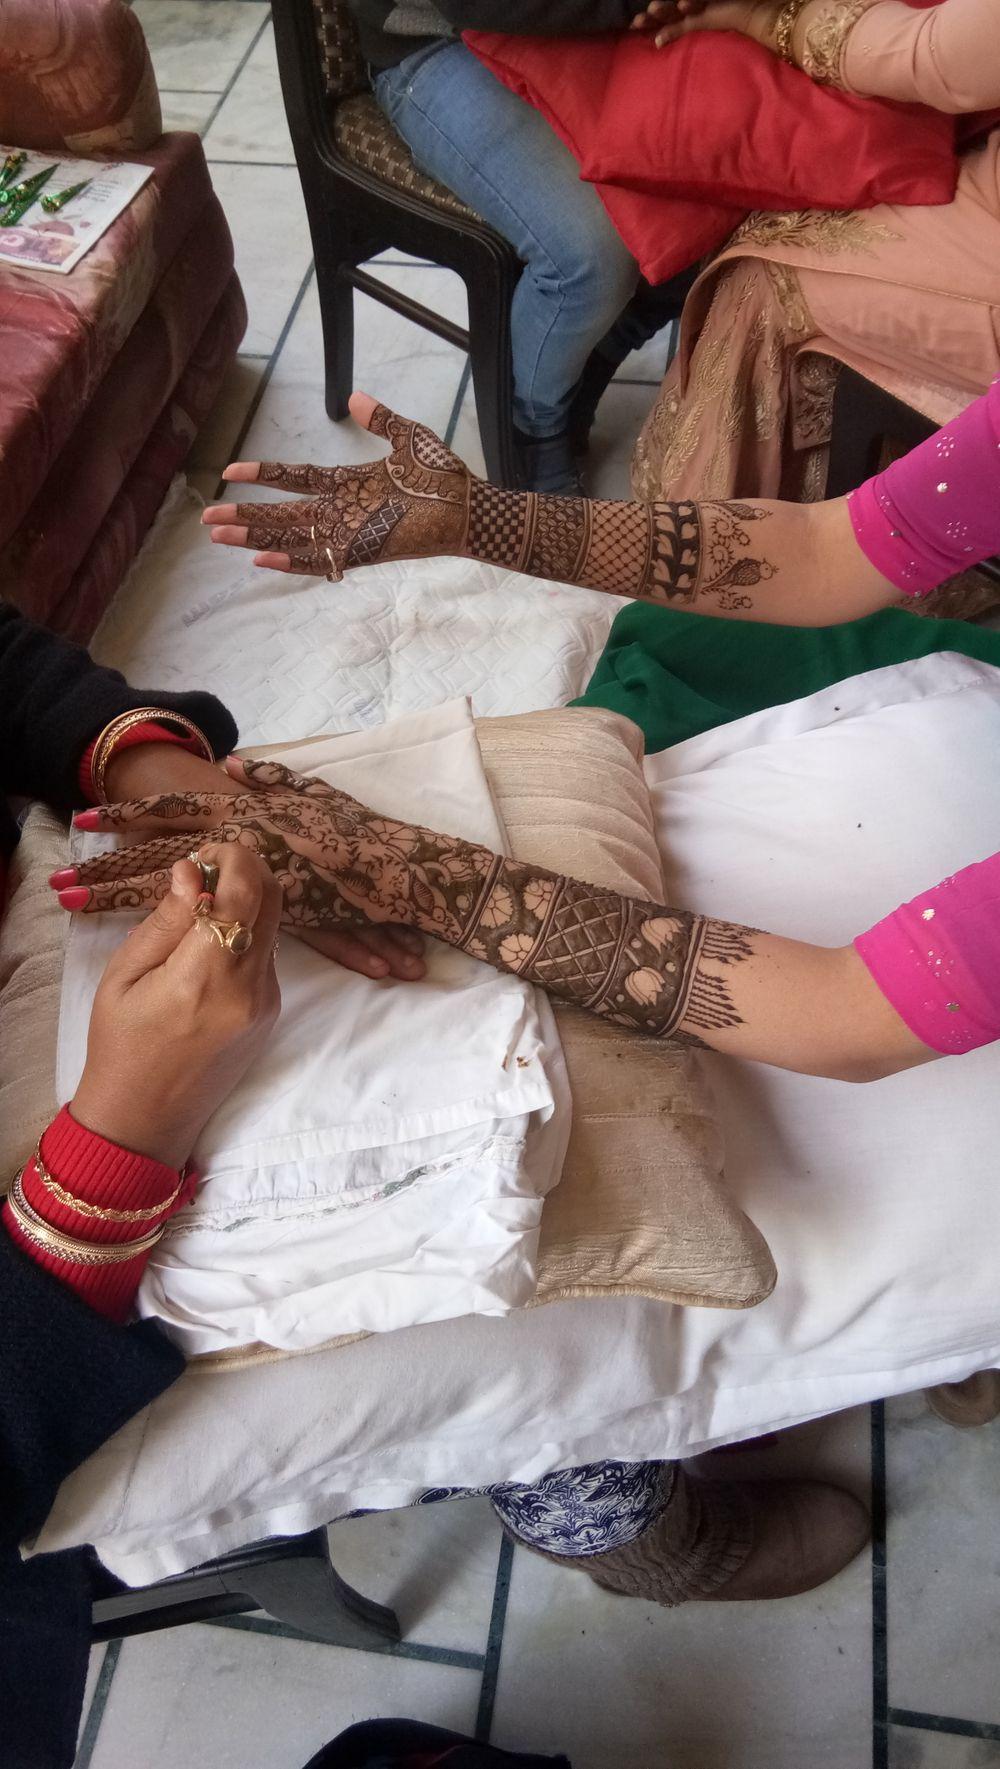 Photo From Japna bridal mehendi at Tagore garden,  New DELHI on 26 Dec 2017 - By Shalini Mehendi Artist